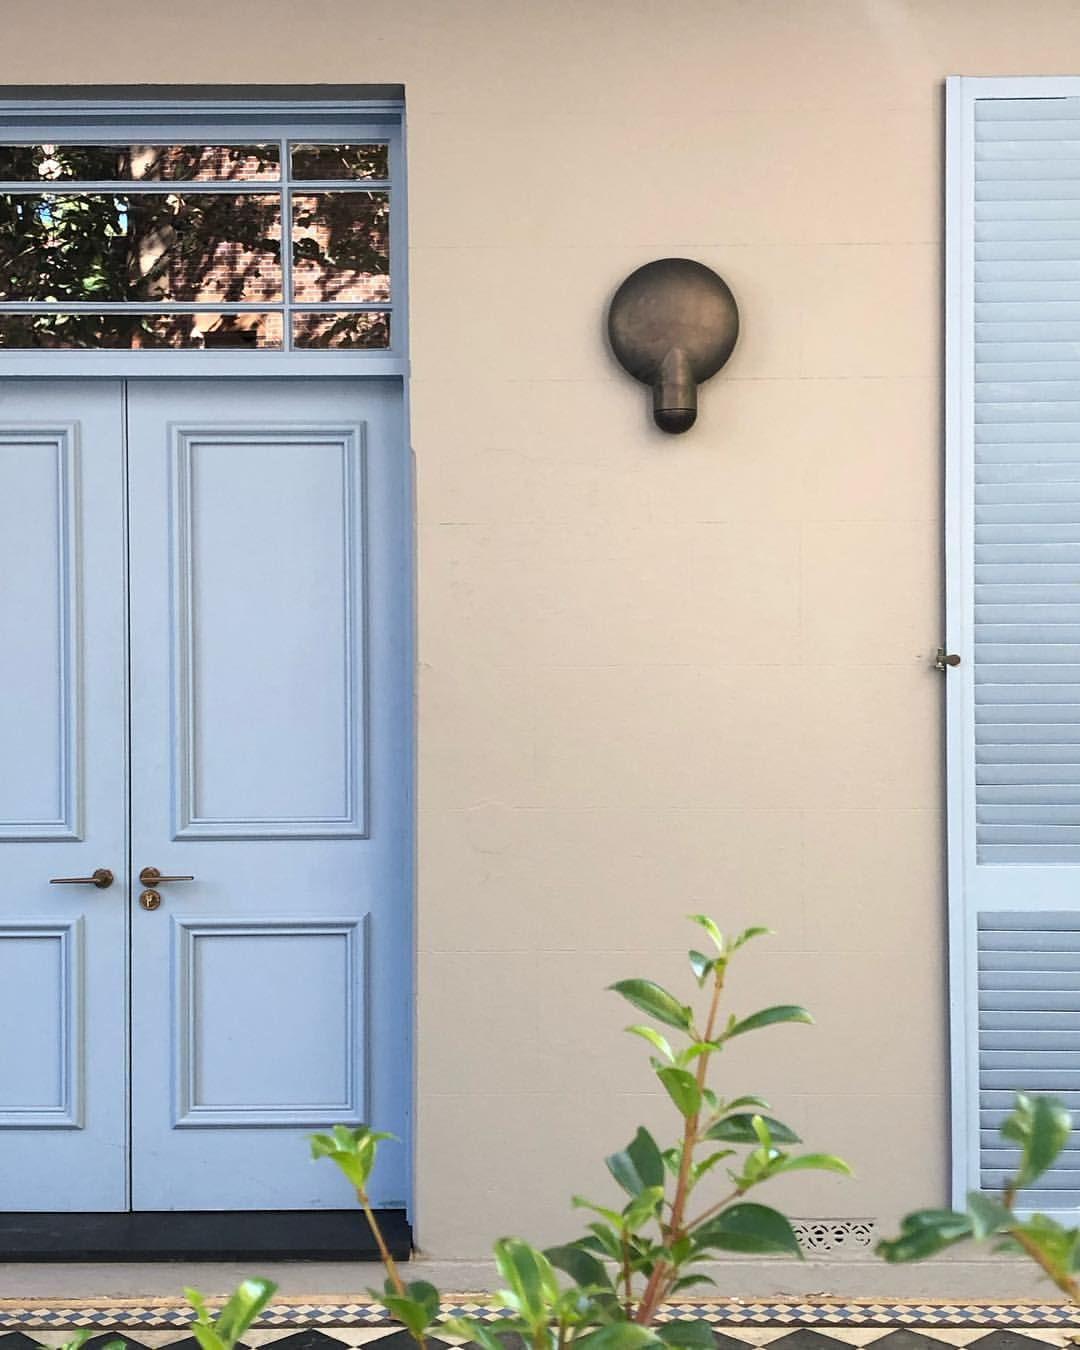 Endo Room Design: Pin By Endo Kuala Lumpur On Door In 2019